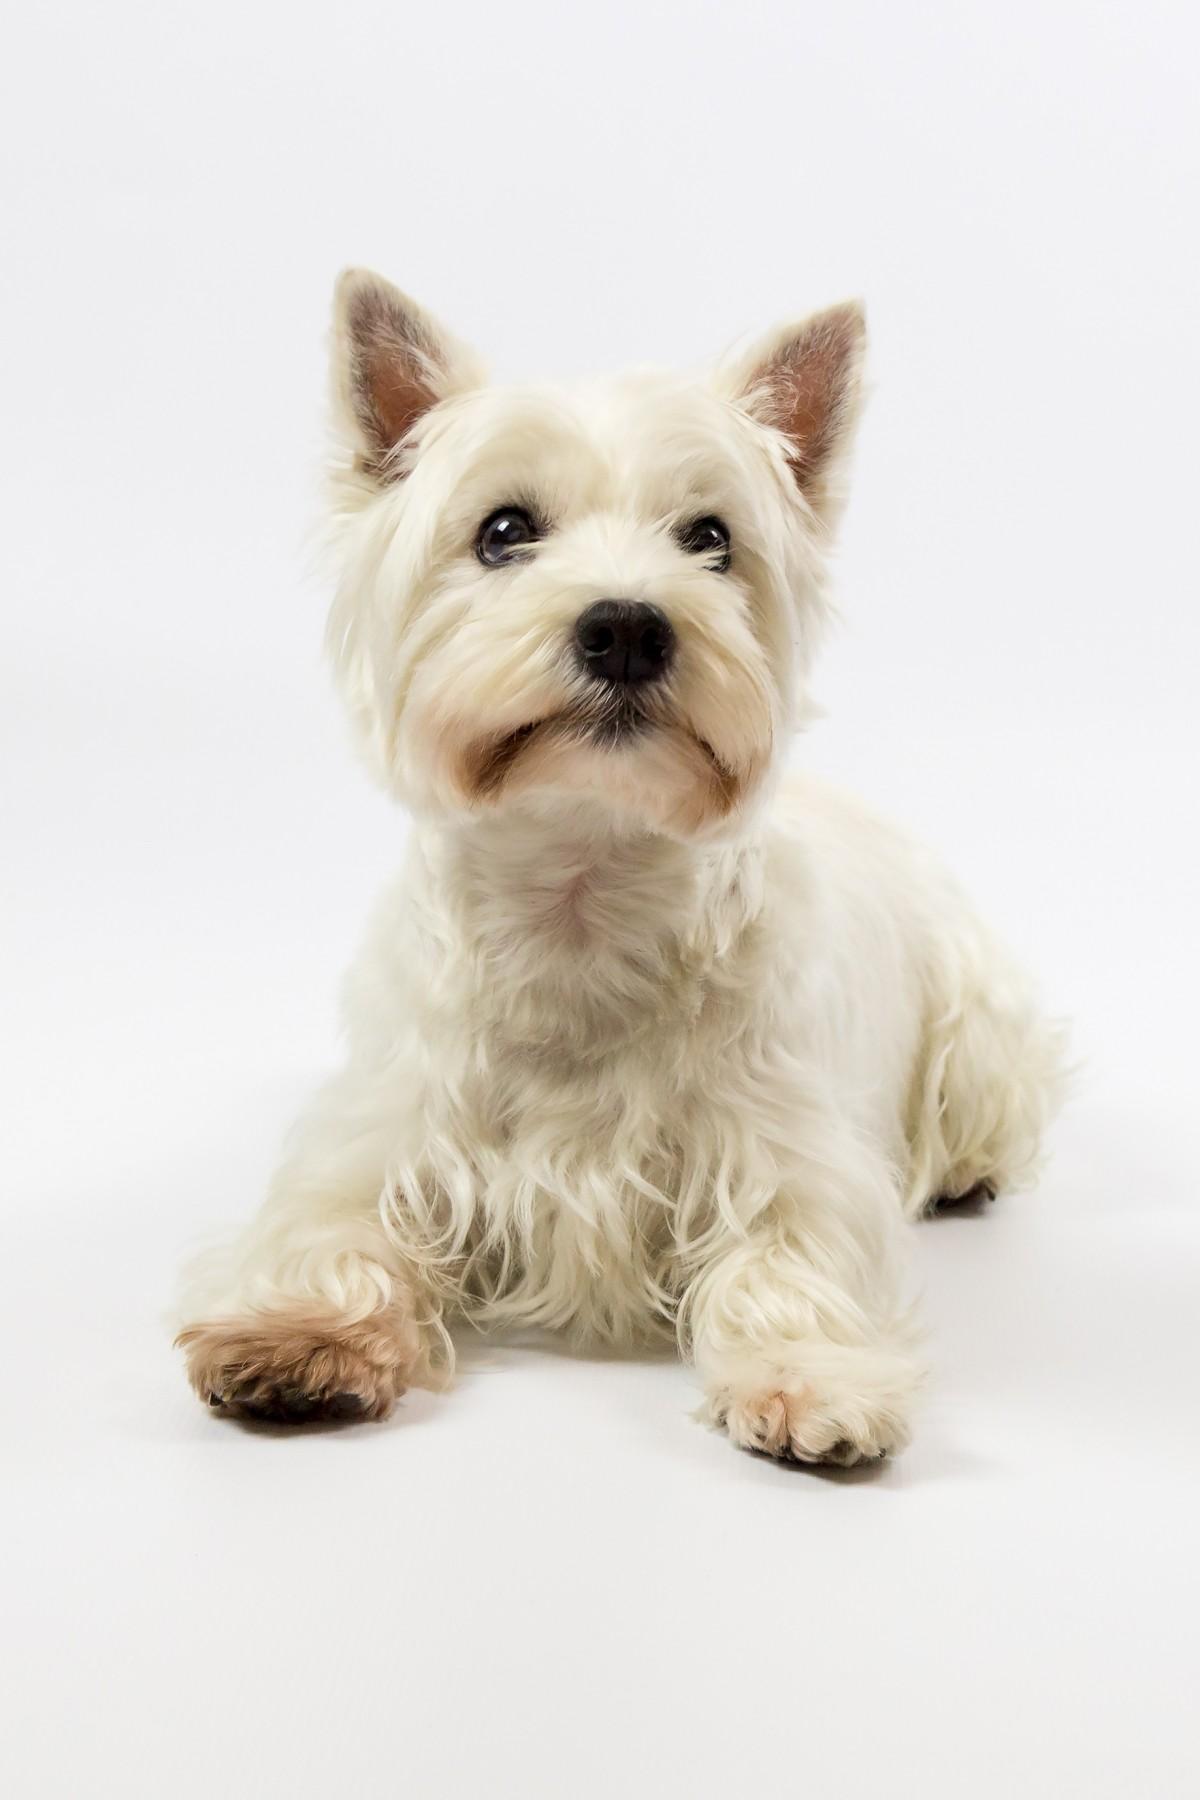 Top Cairn Terrier Ball Adorable Dog - west_highland_terrier_westie_west_highland_white_terrier_terrier_dog_white_pet_pedigree-1208298  Snapshot_43848  .jpg!d